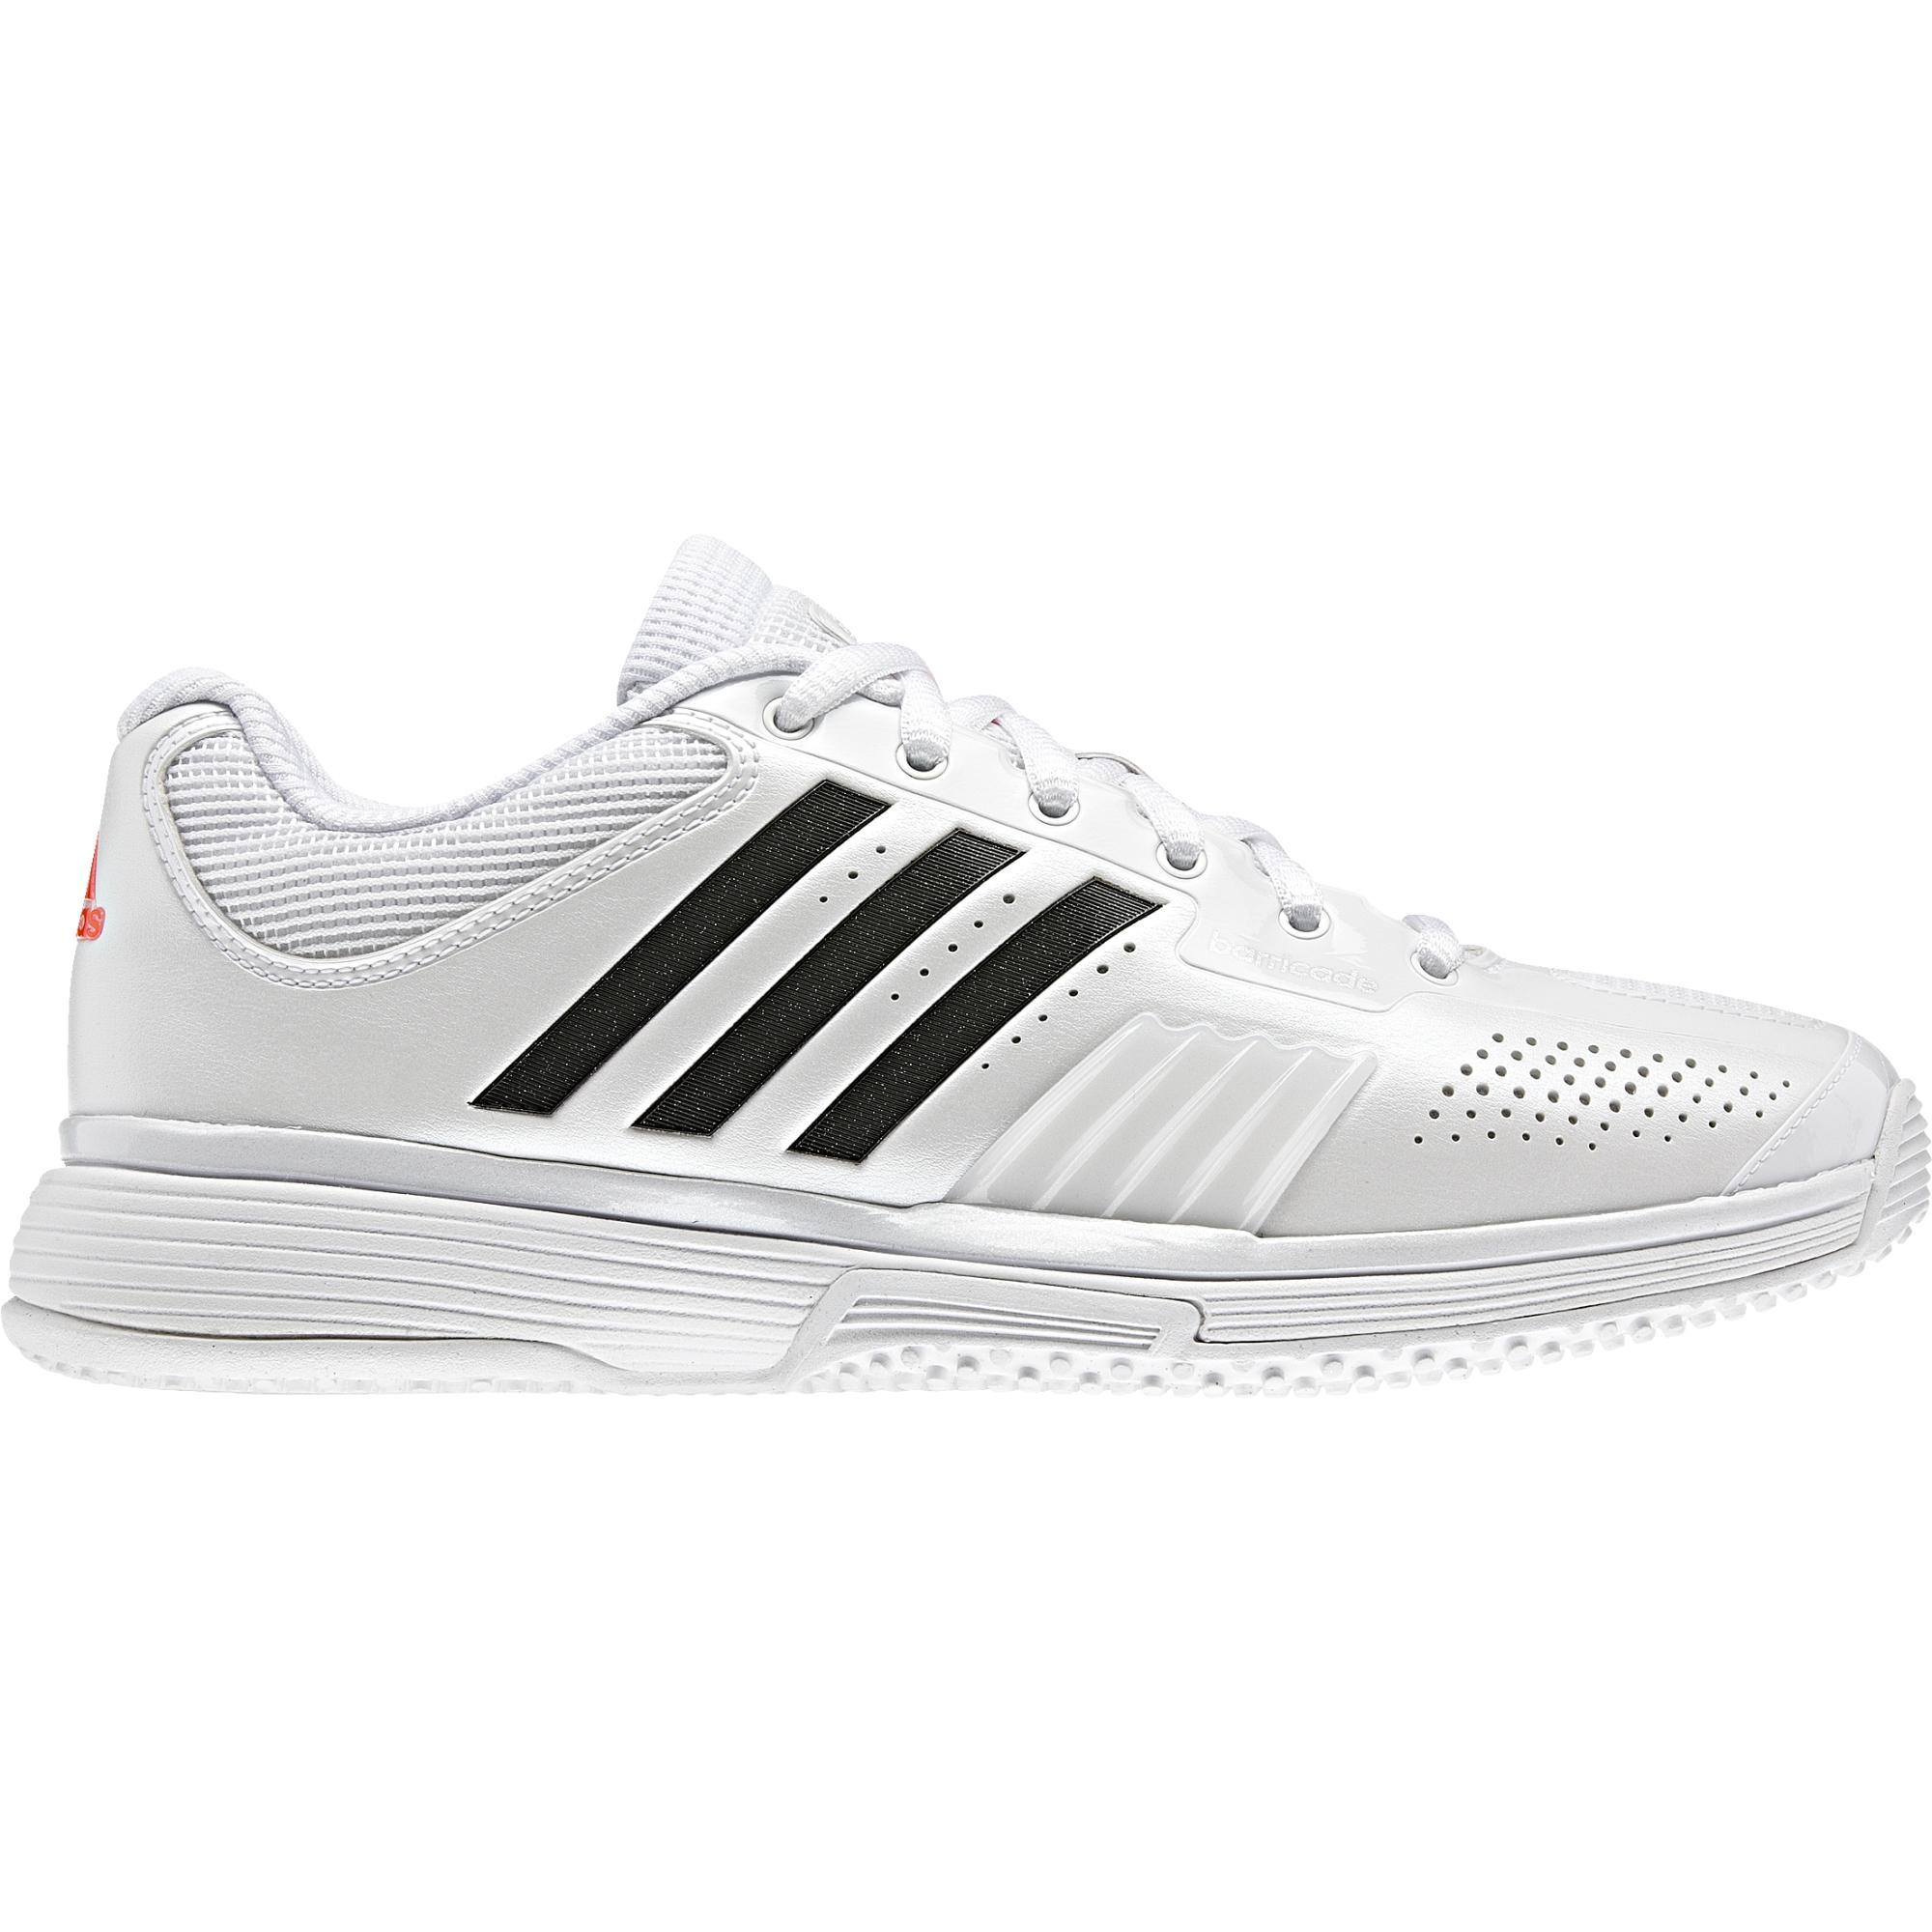 9f5ab1064855 Adidas Womens Adipower Barricade Grass Court Tennis Shoes - White -  Tennisnuts.com